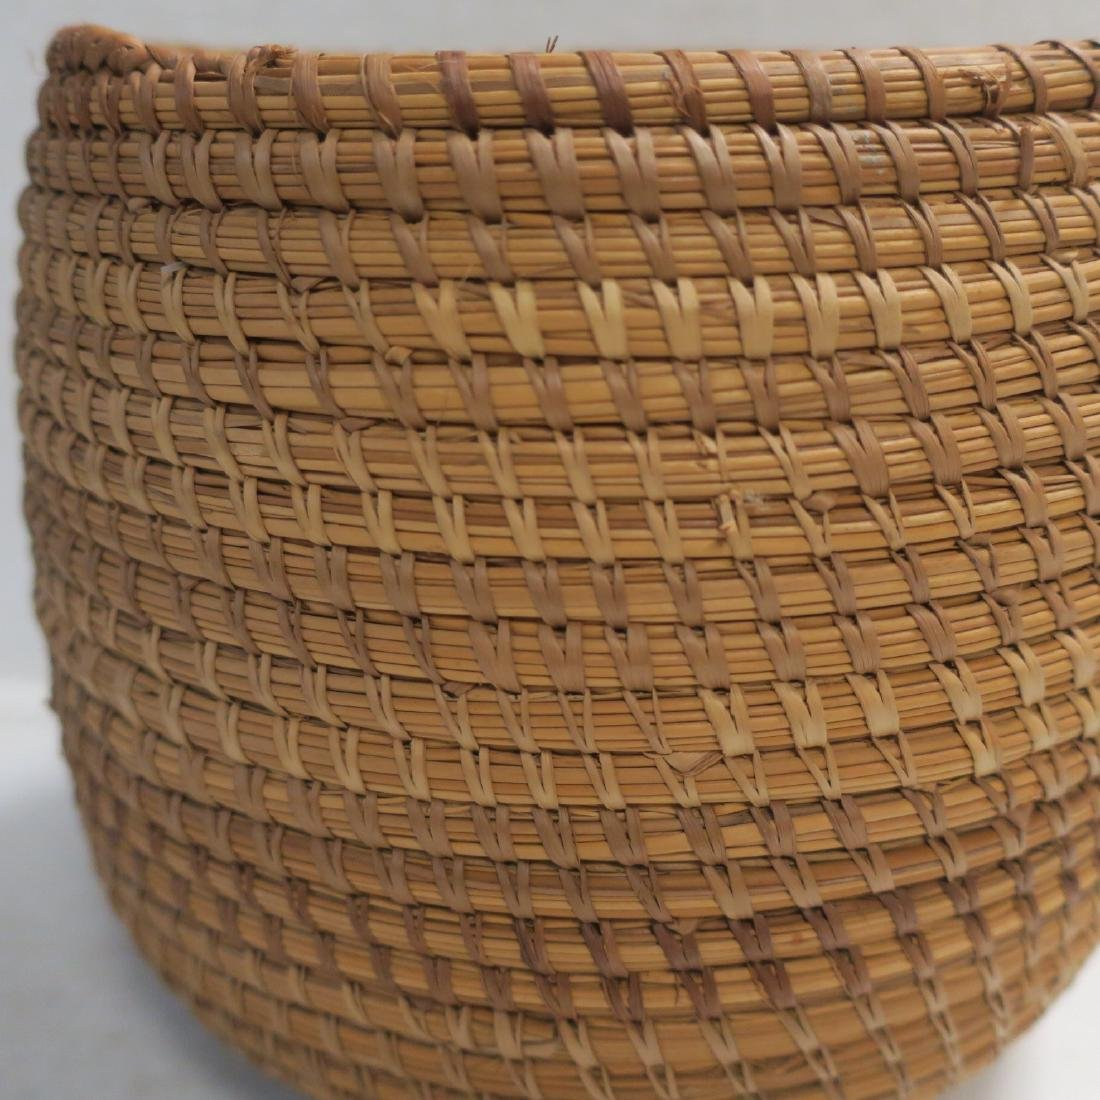 Handmade Natural Woven Coil Basket: - 2